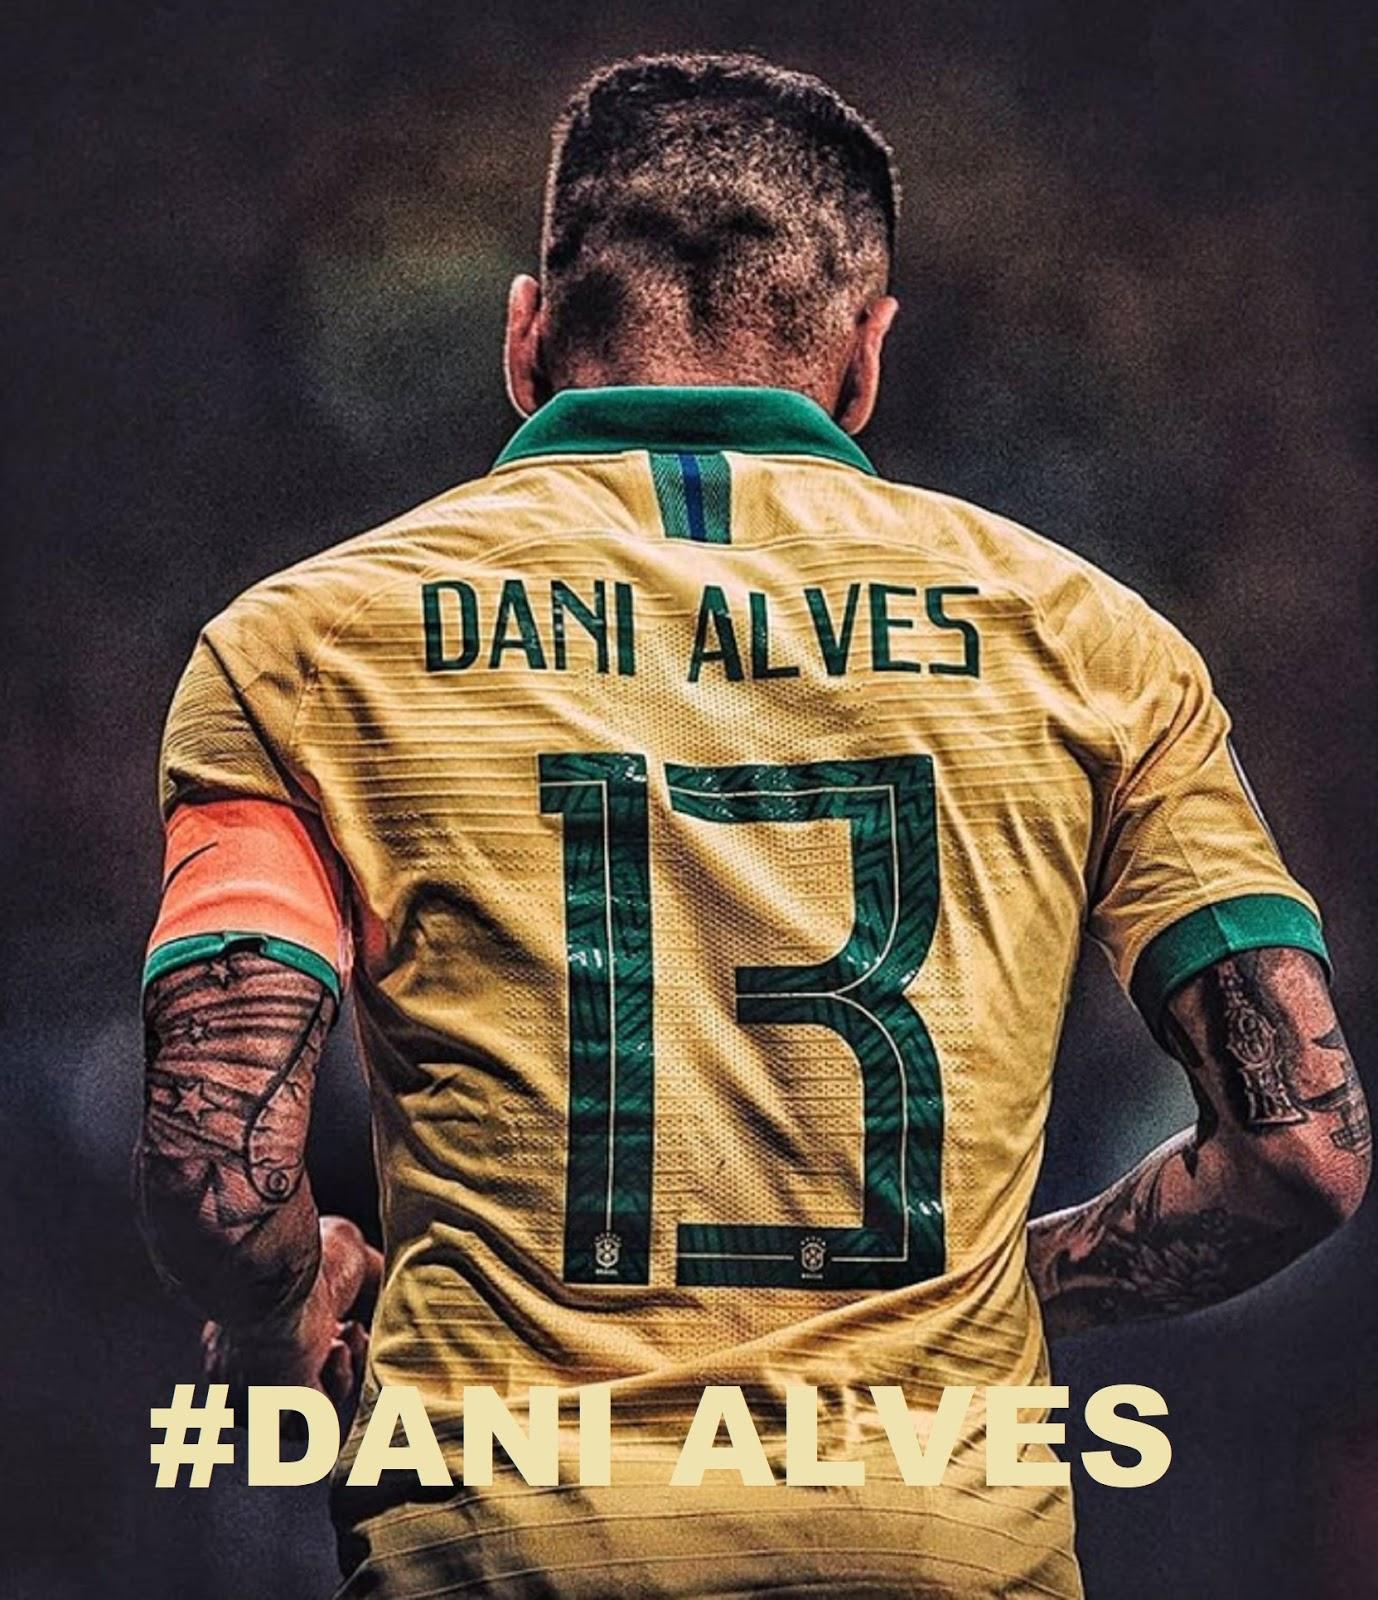 DANI ALVES 2